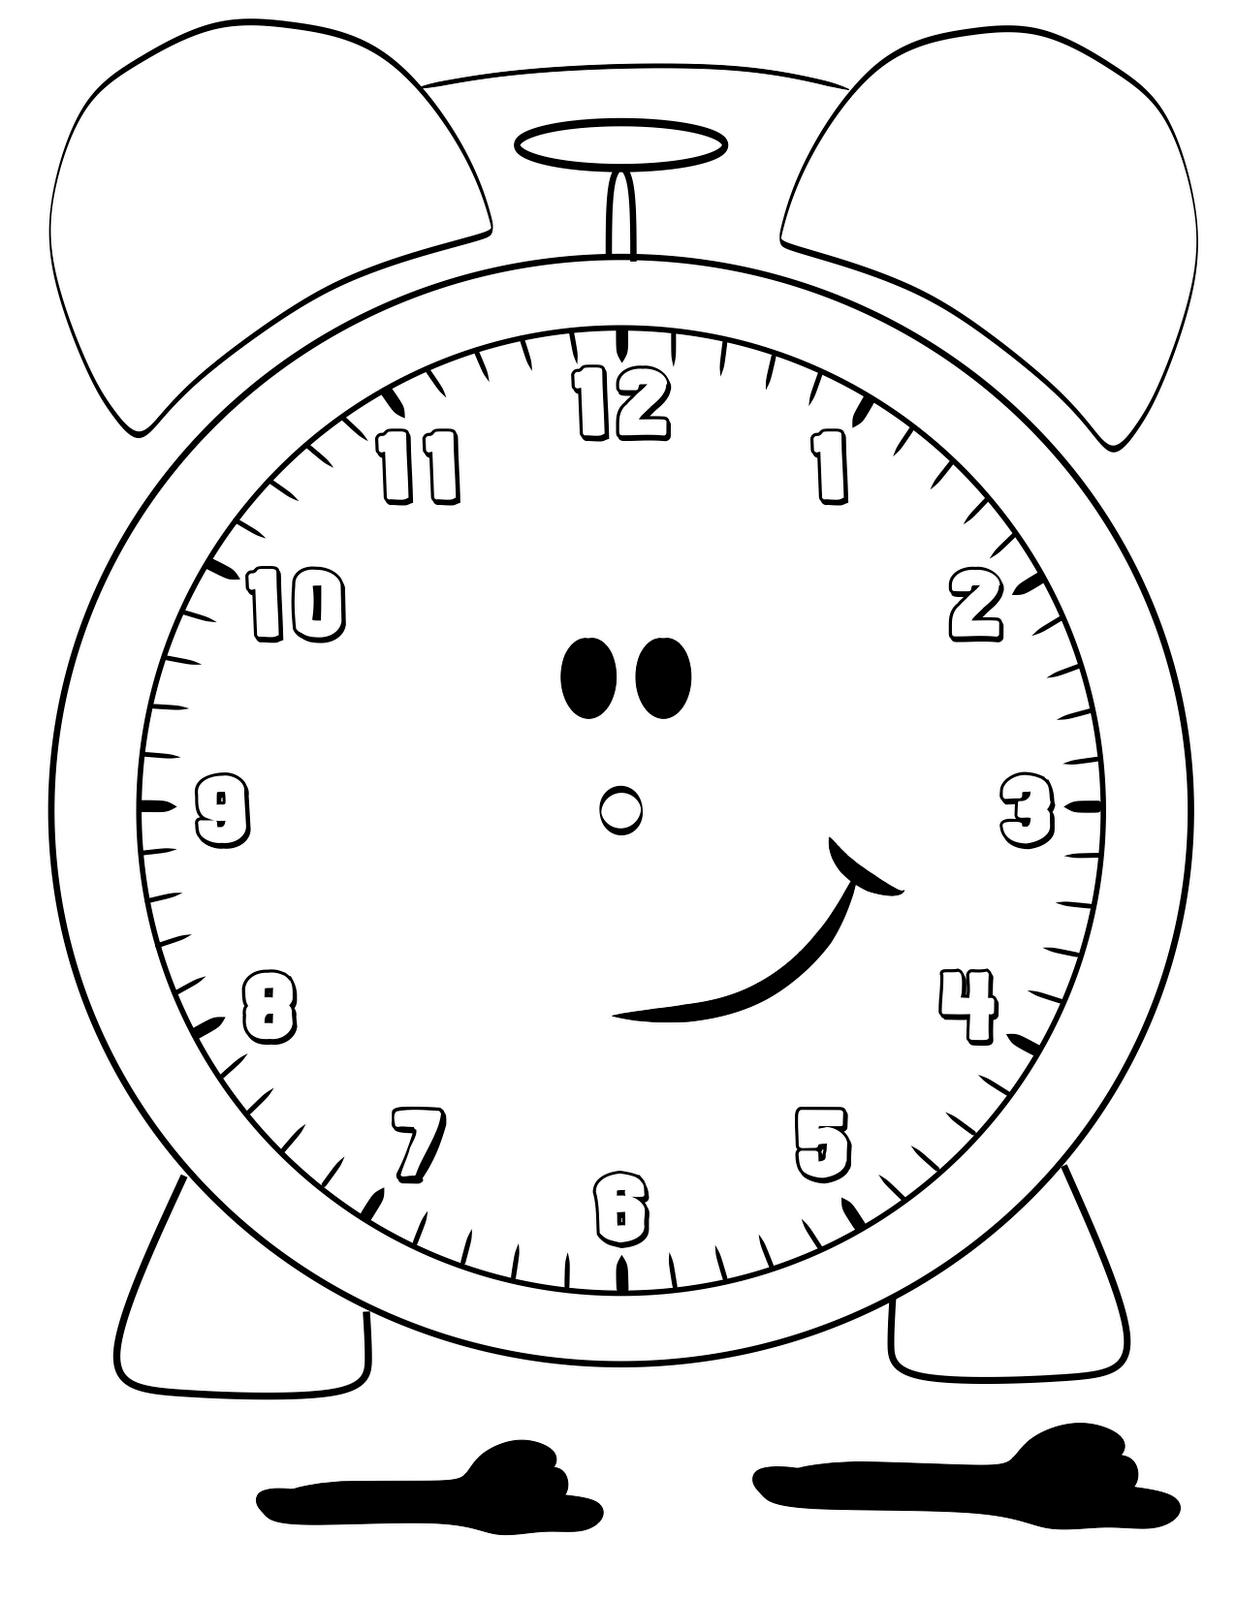 clock coloring page printable clock coloring pages for kids cool2bkids page clock coloring